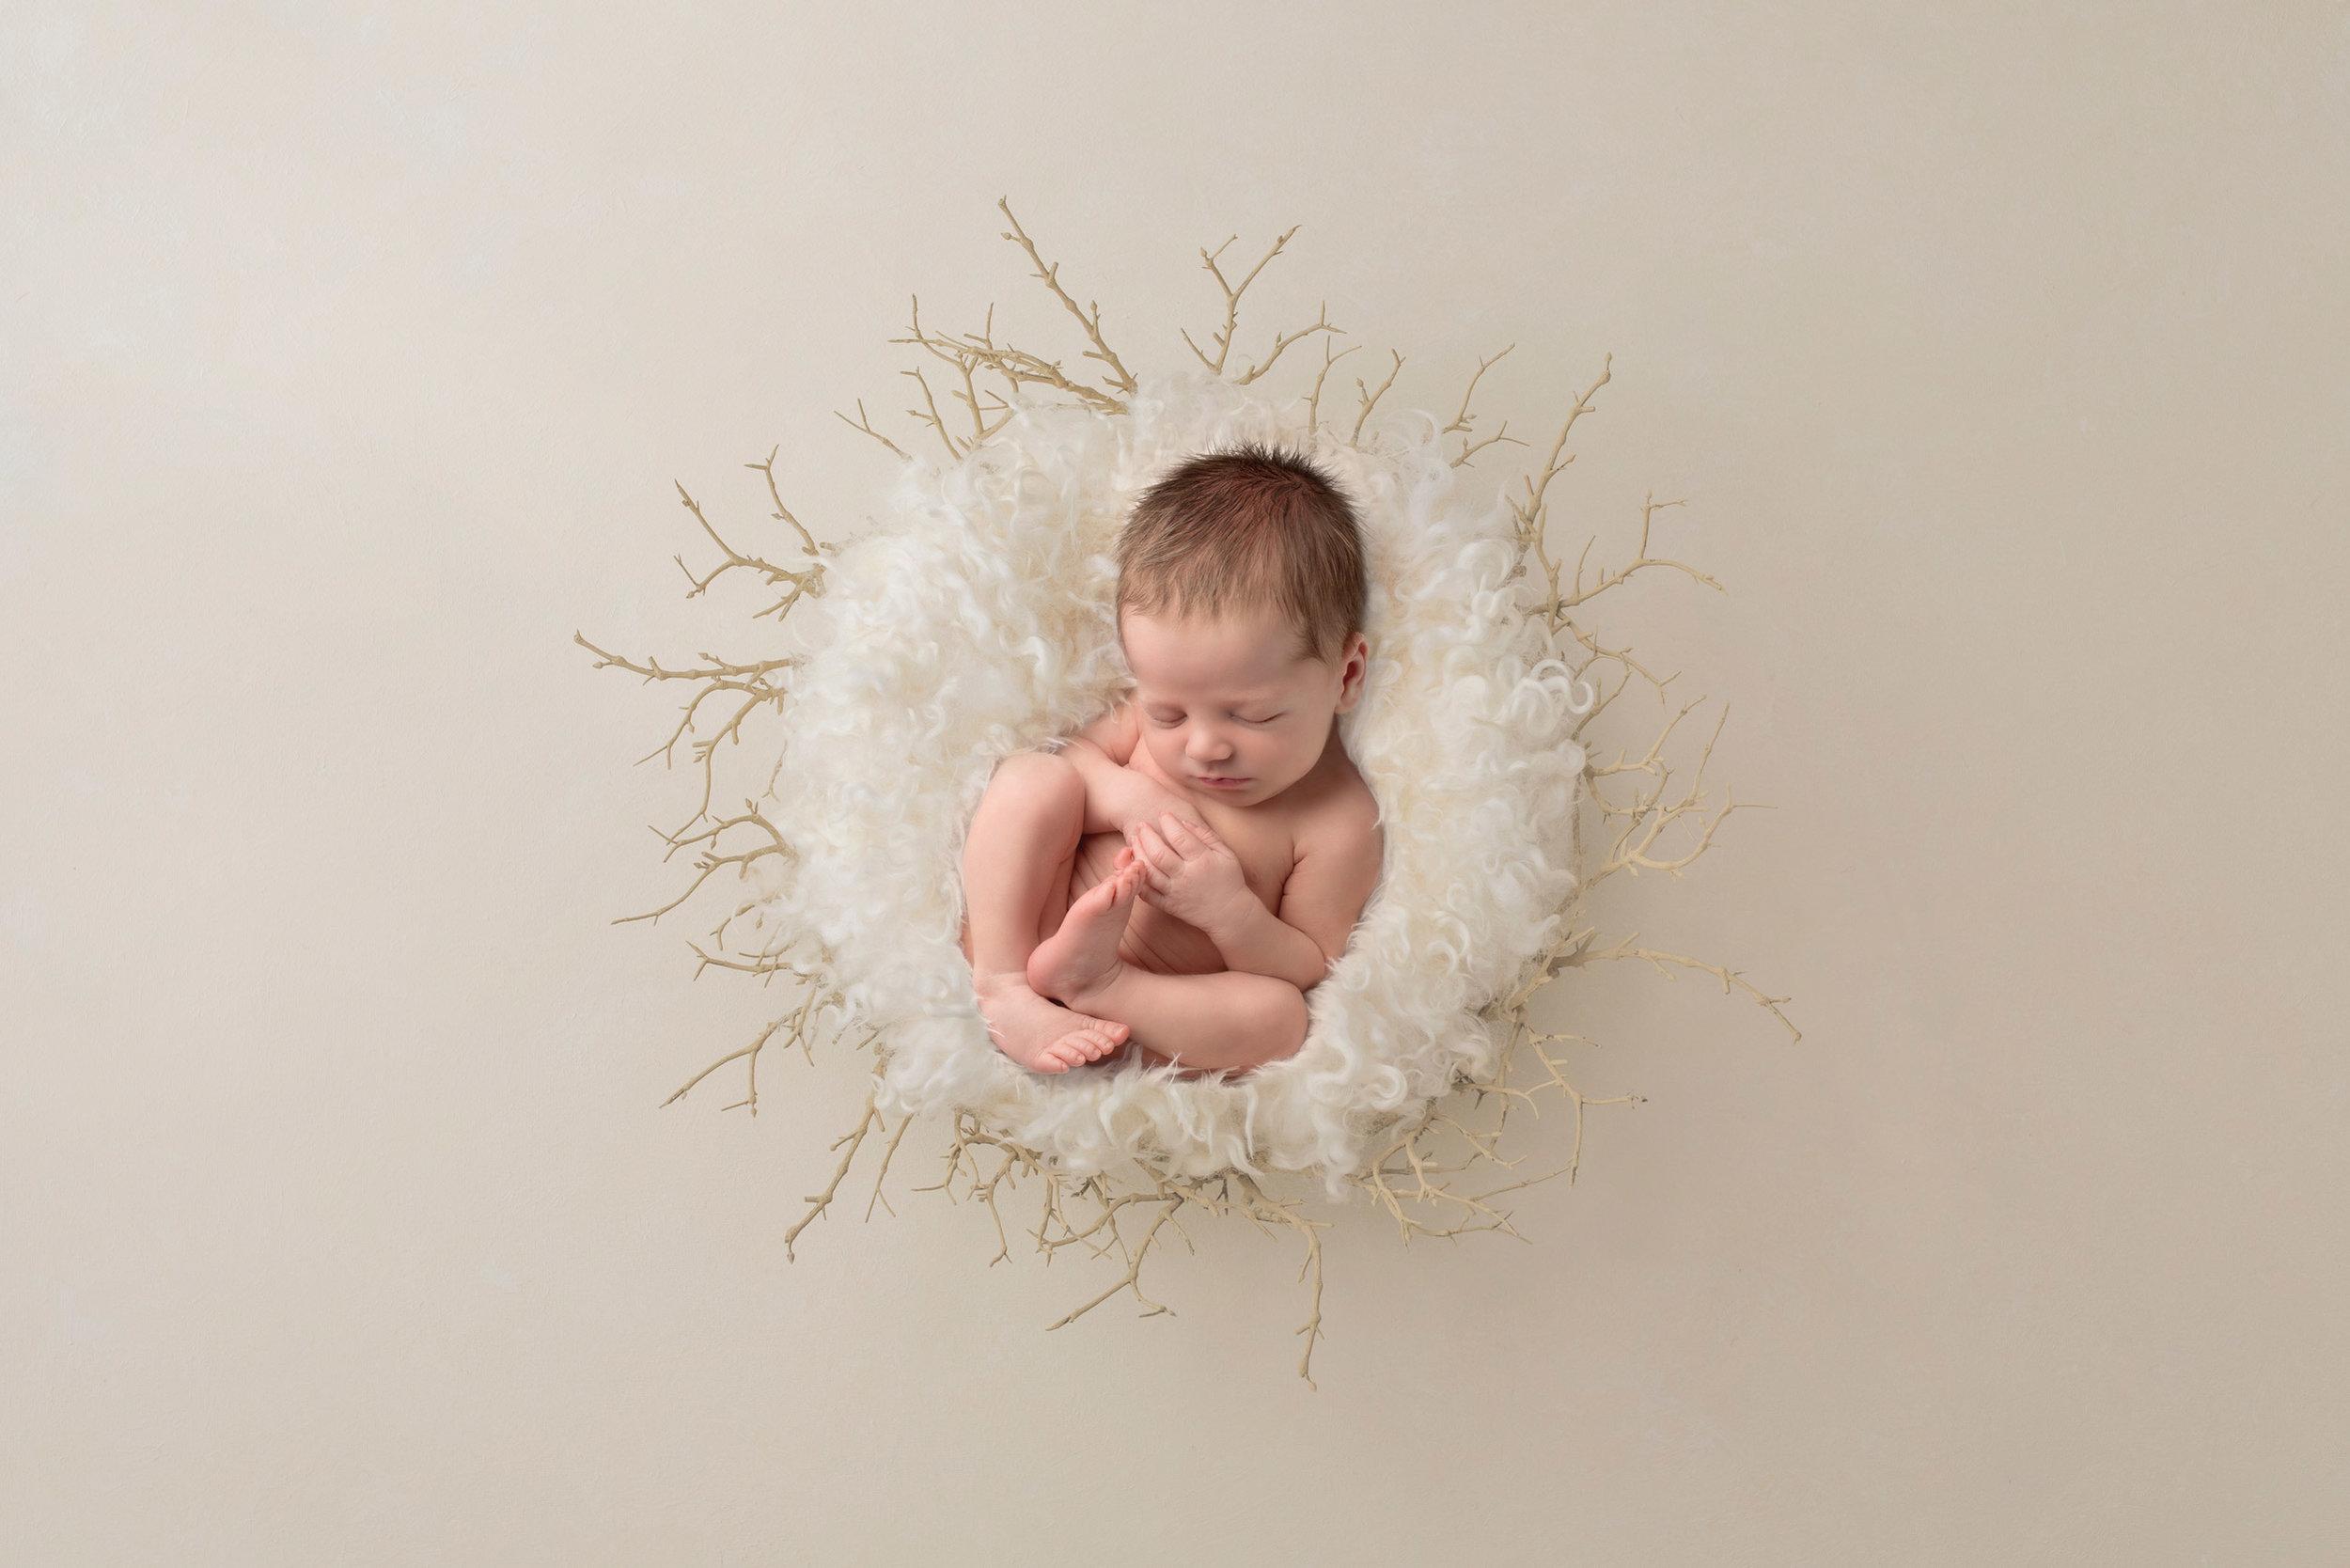 newborn boy lays asleep on white fluff inside a white twig bowl for his newborn photo shoot in hemel hempstead